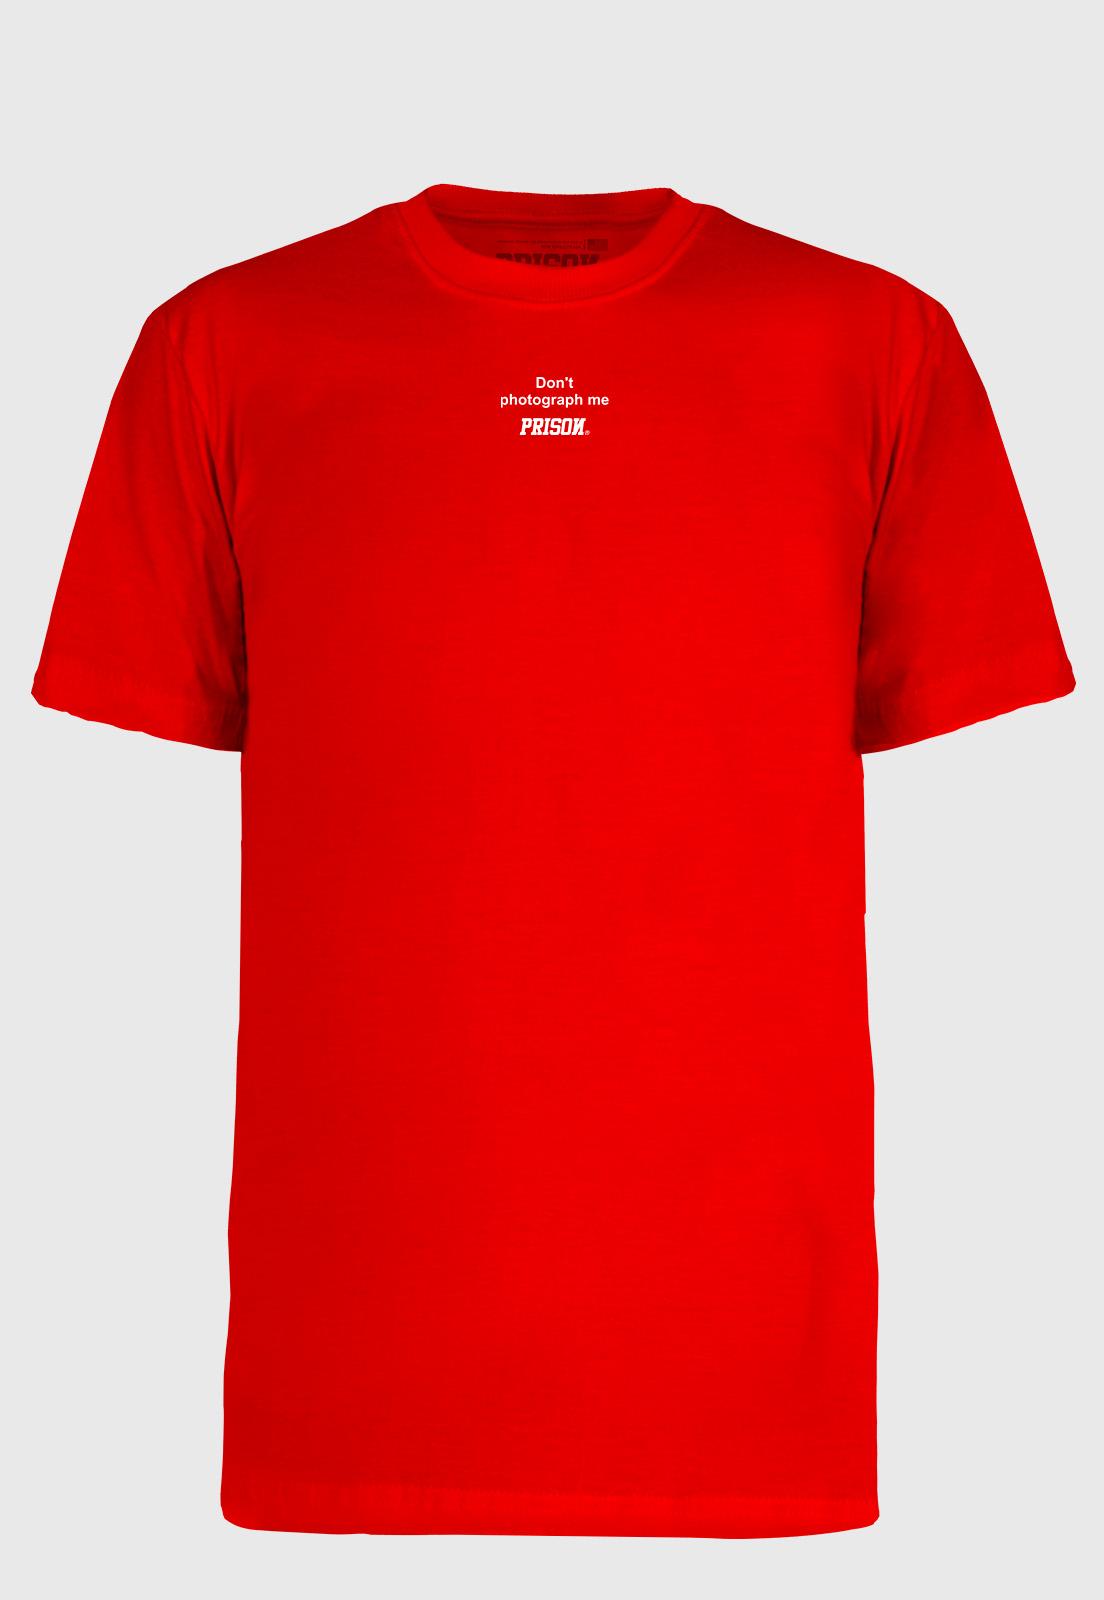 Camiseta Streetwear Prison Don´t Photograph Me Red